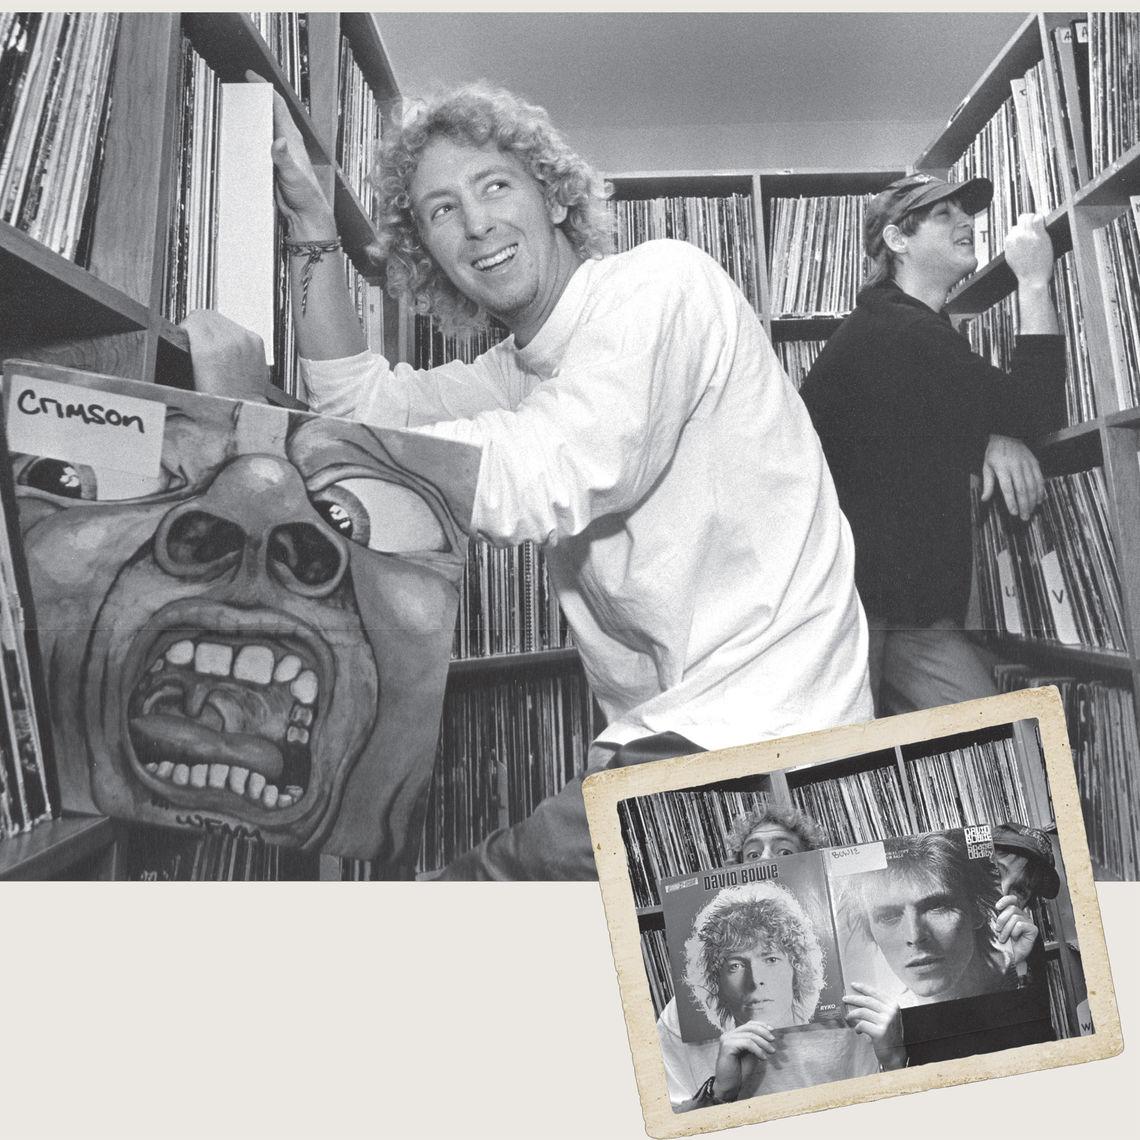 Dave Mann '94 (left) and Rich Quinlan '95